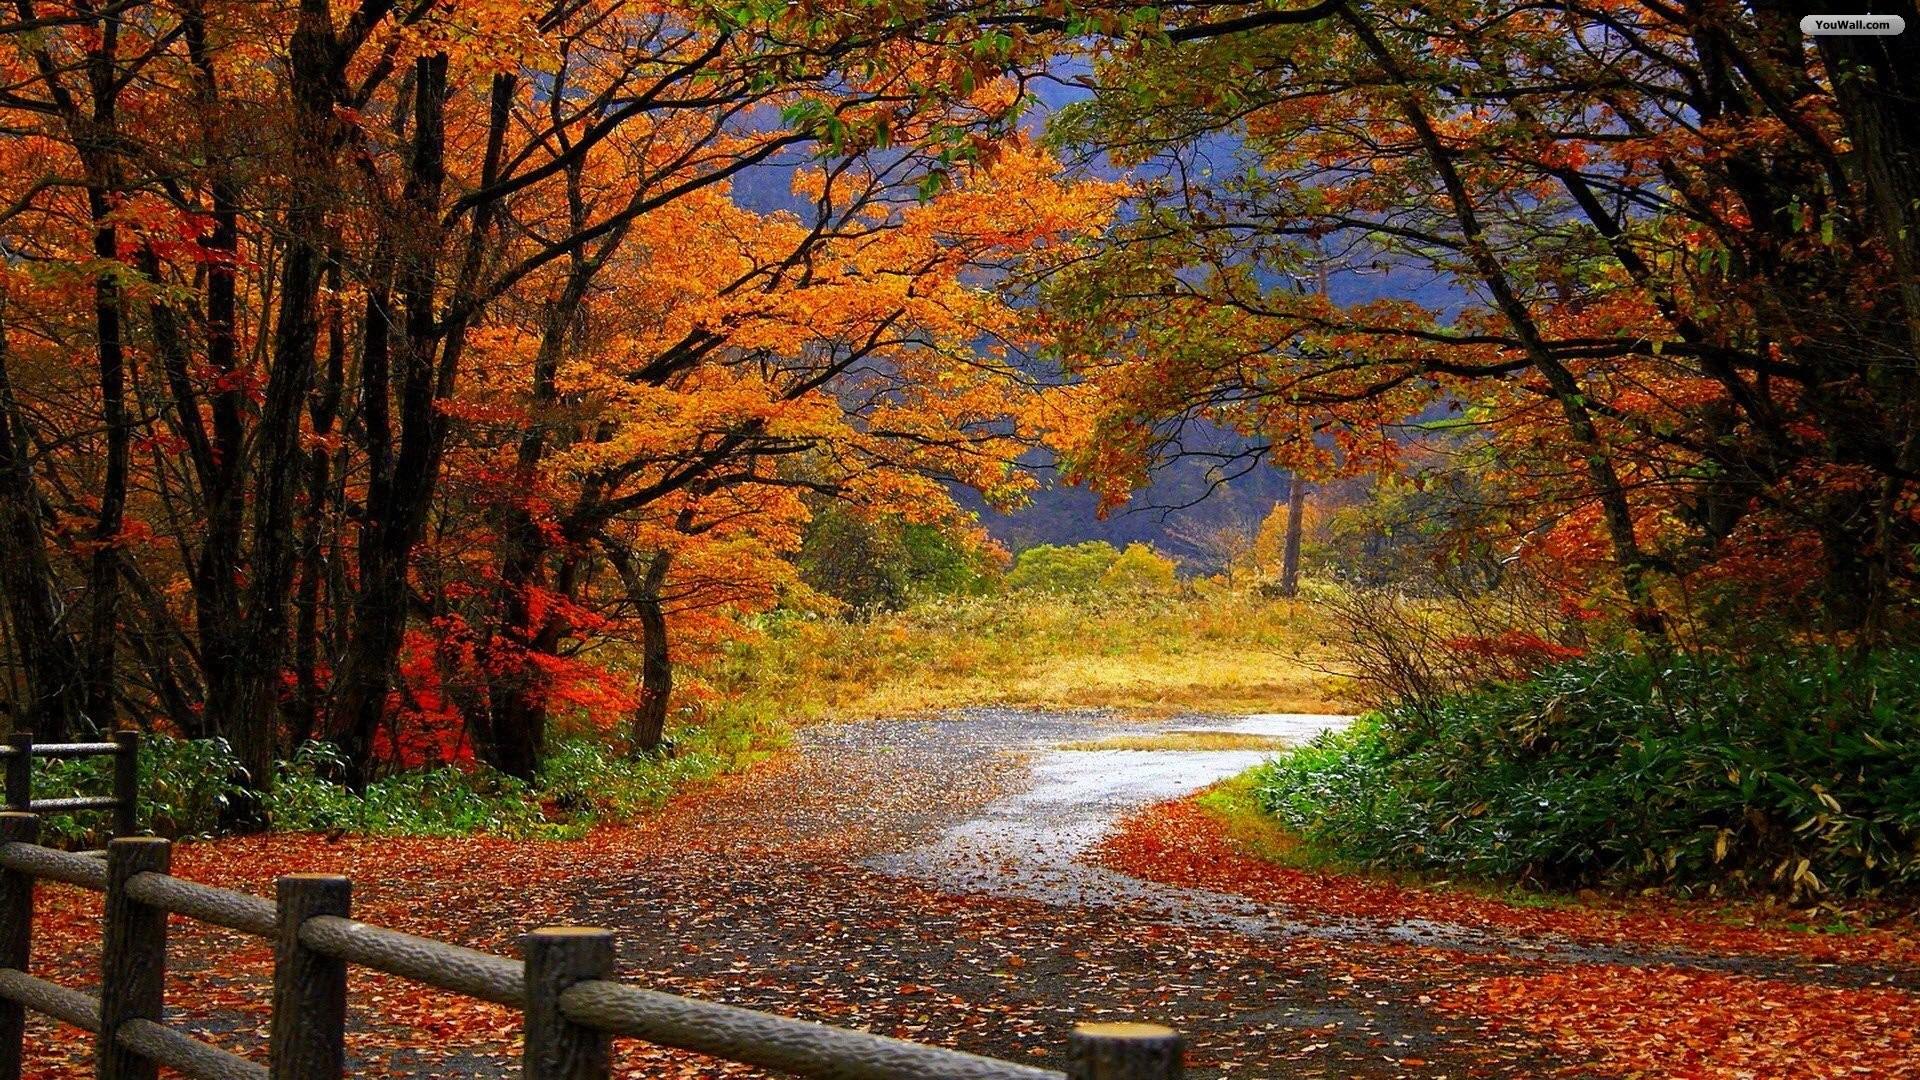 Autumn Scenery Wallpaper – wallpaper,wallpapers,free wallpaper .